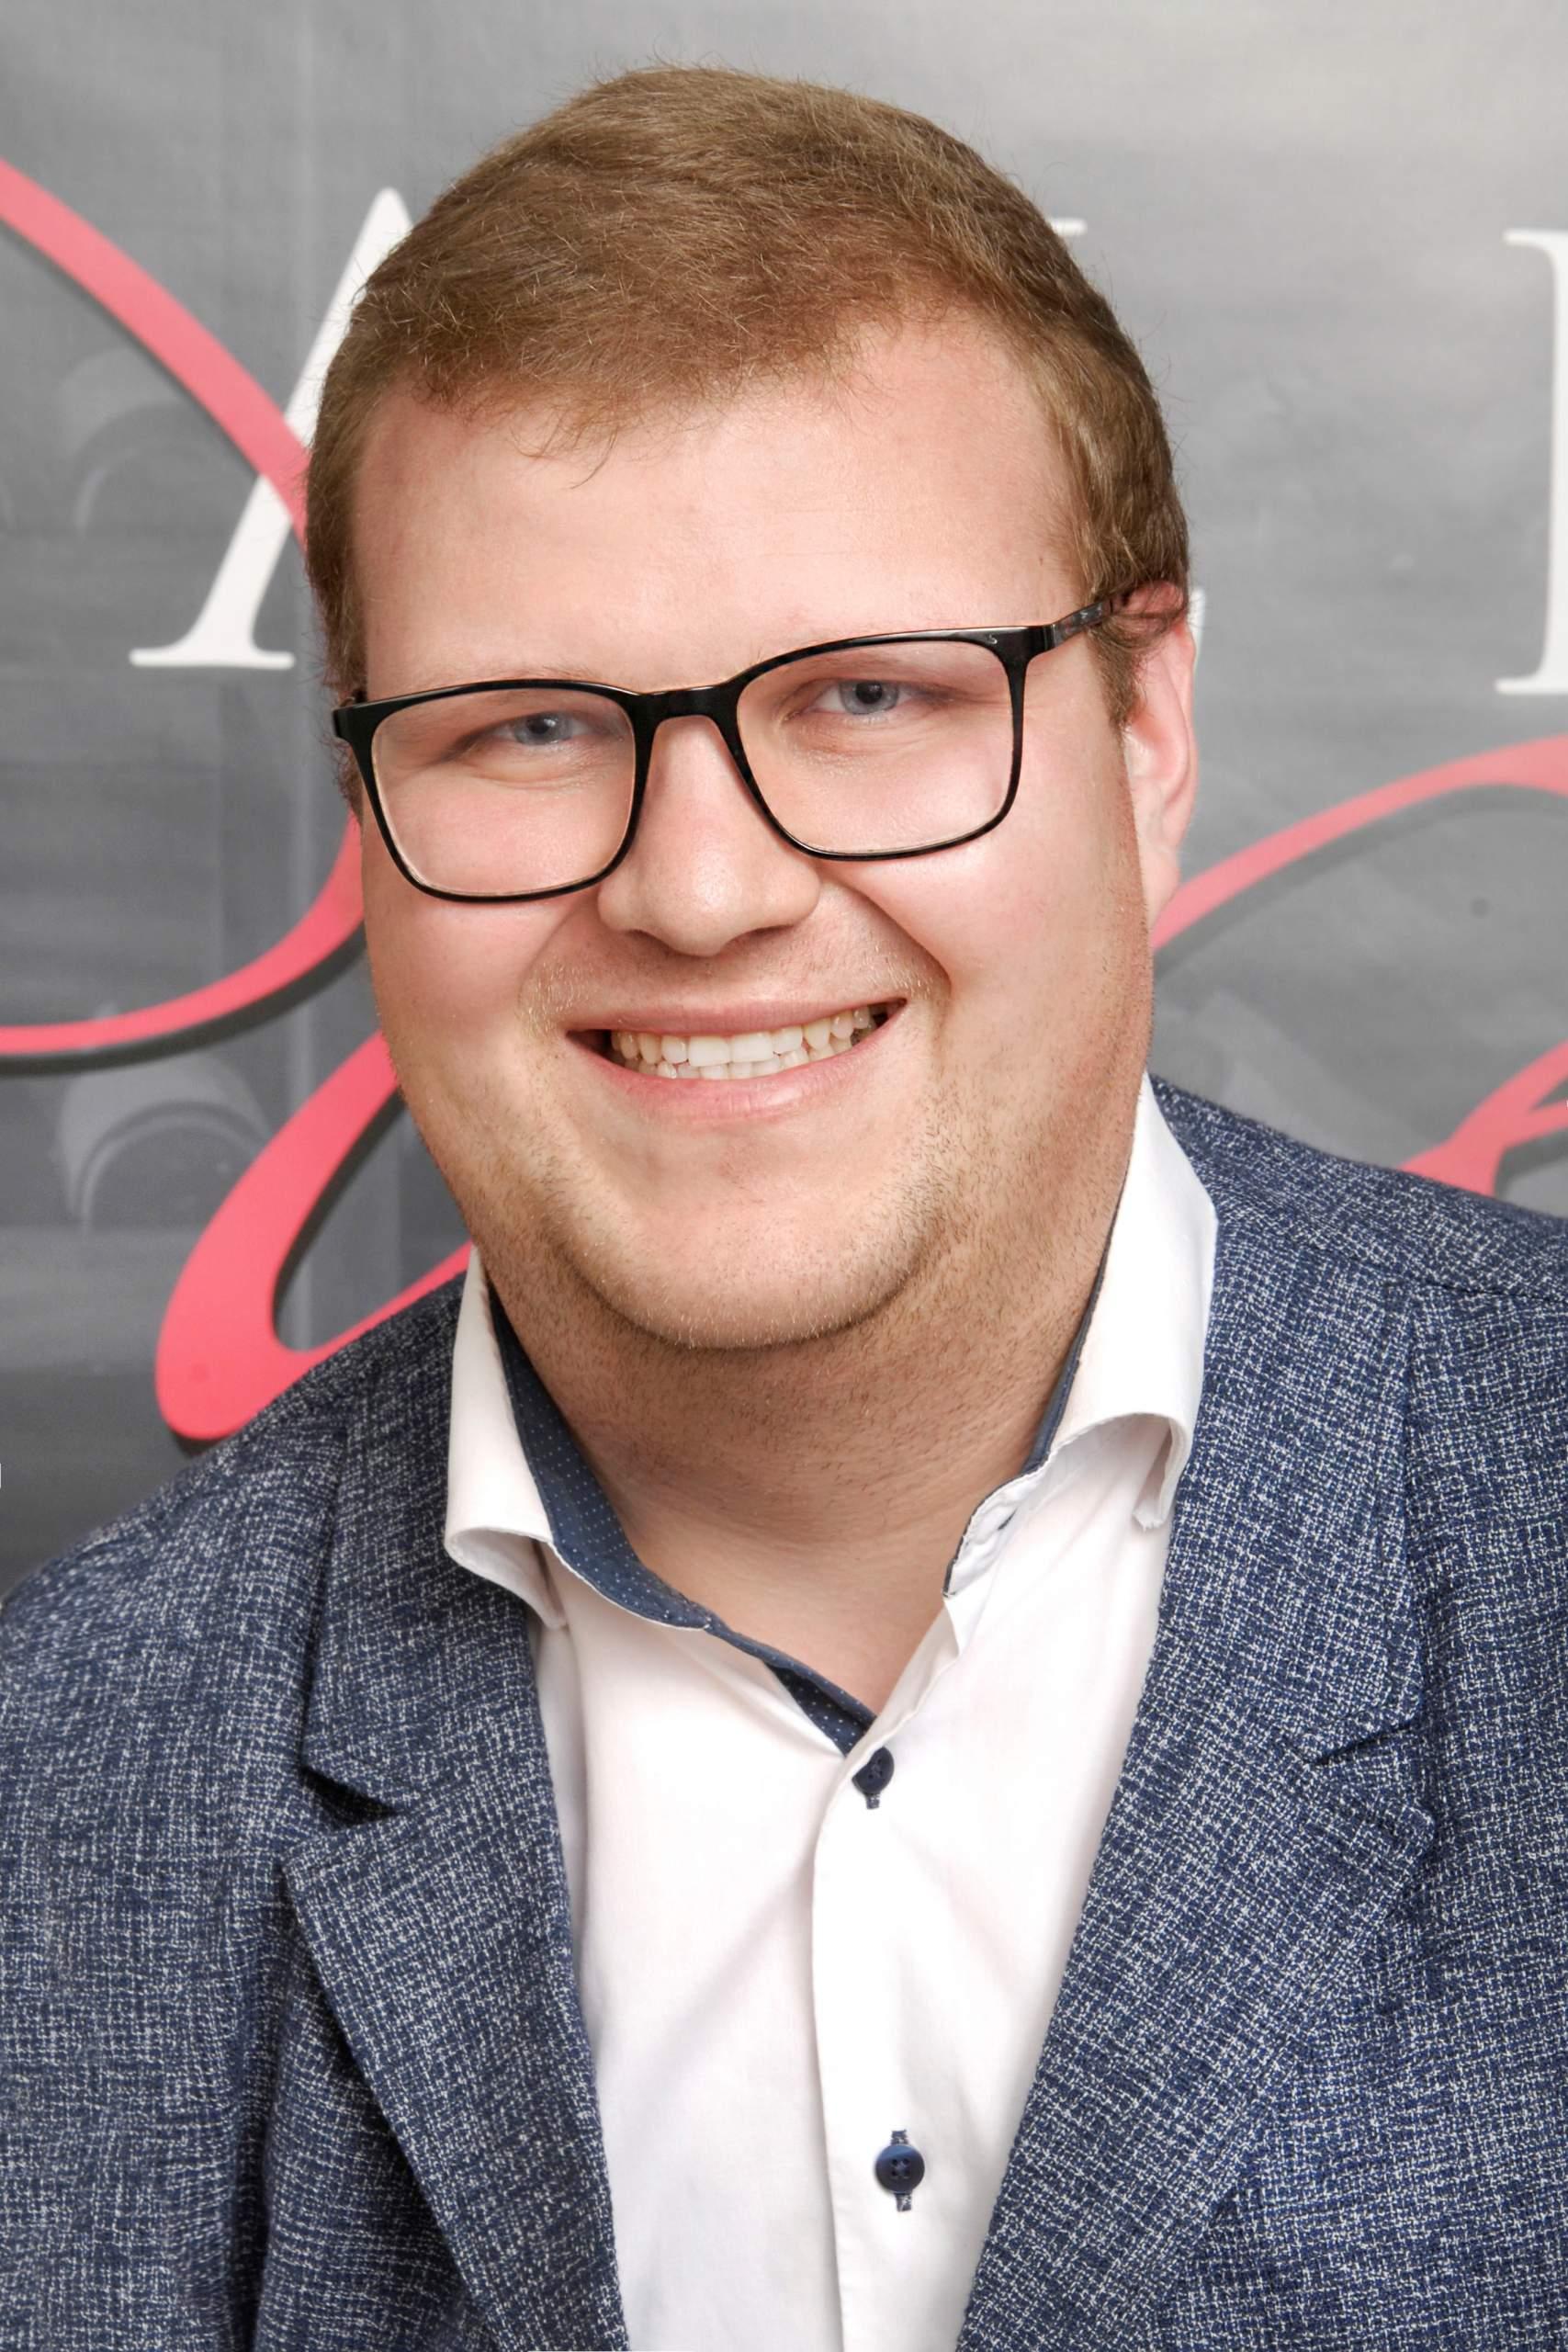 Daniel Linden